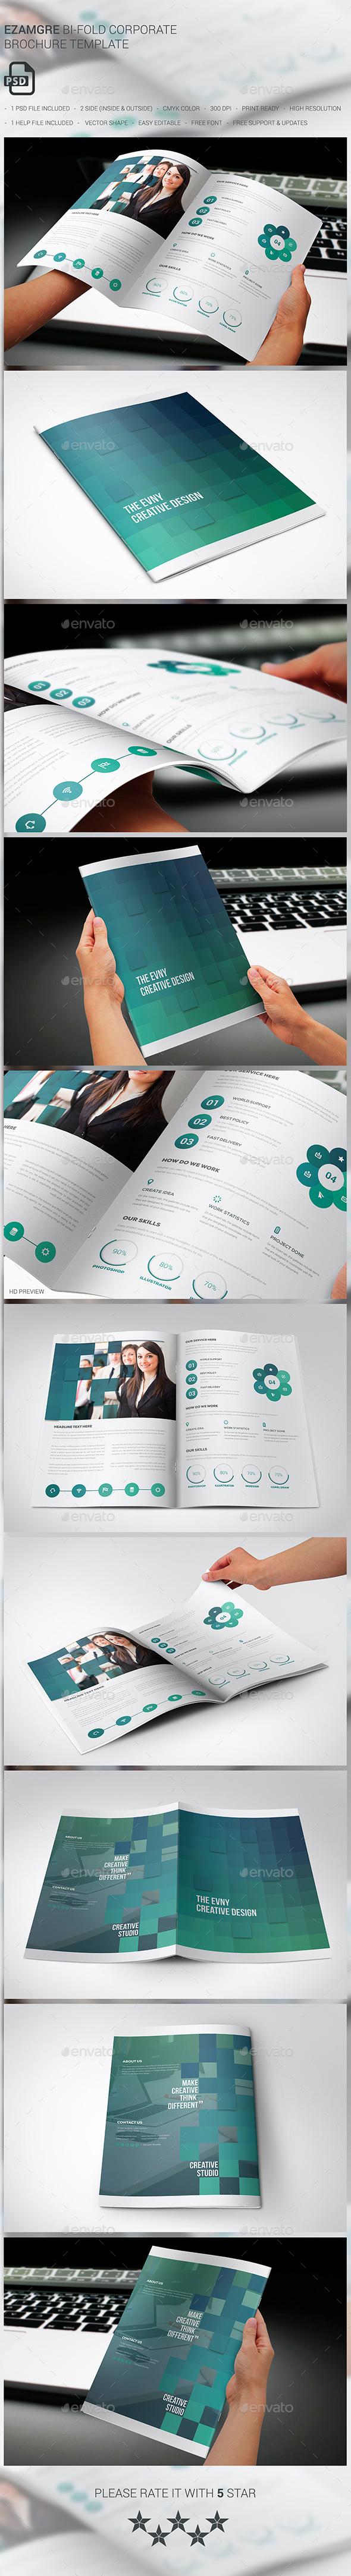 Ezamgre Corporate Bi-fold Brochure - Brochures Print Templates